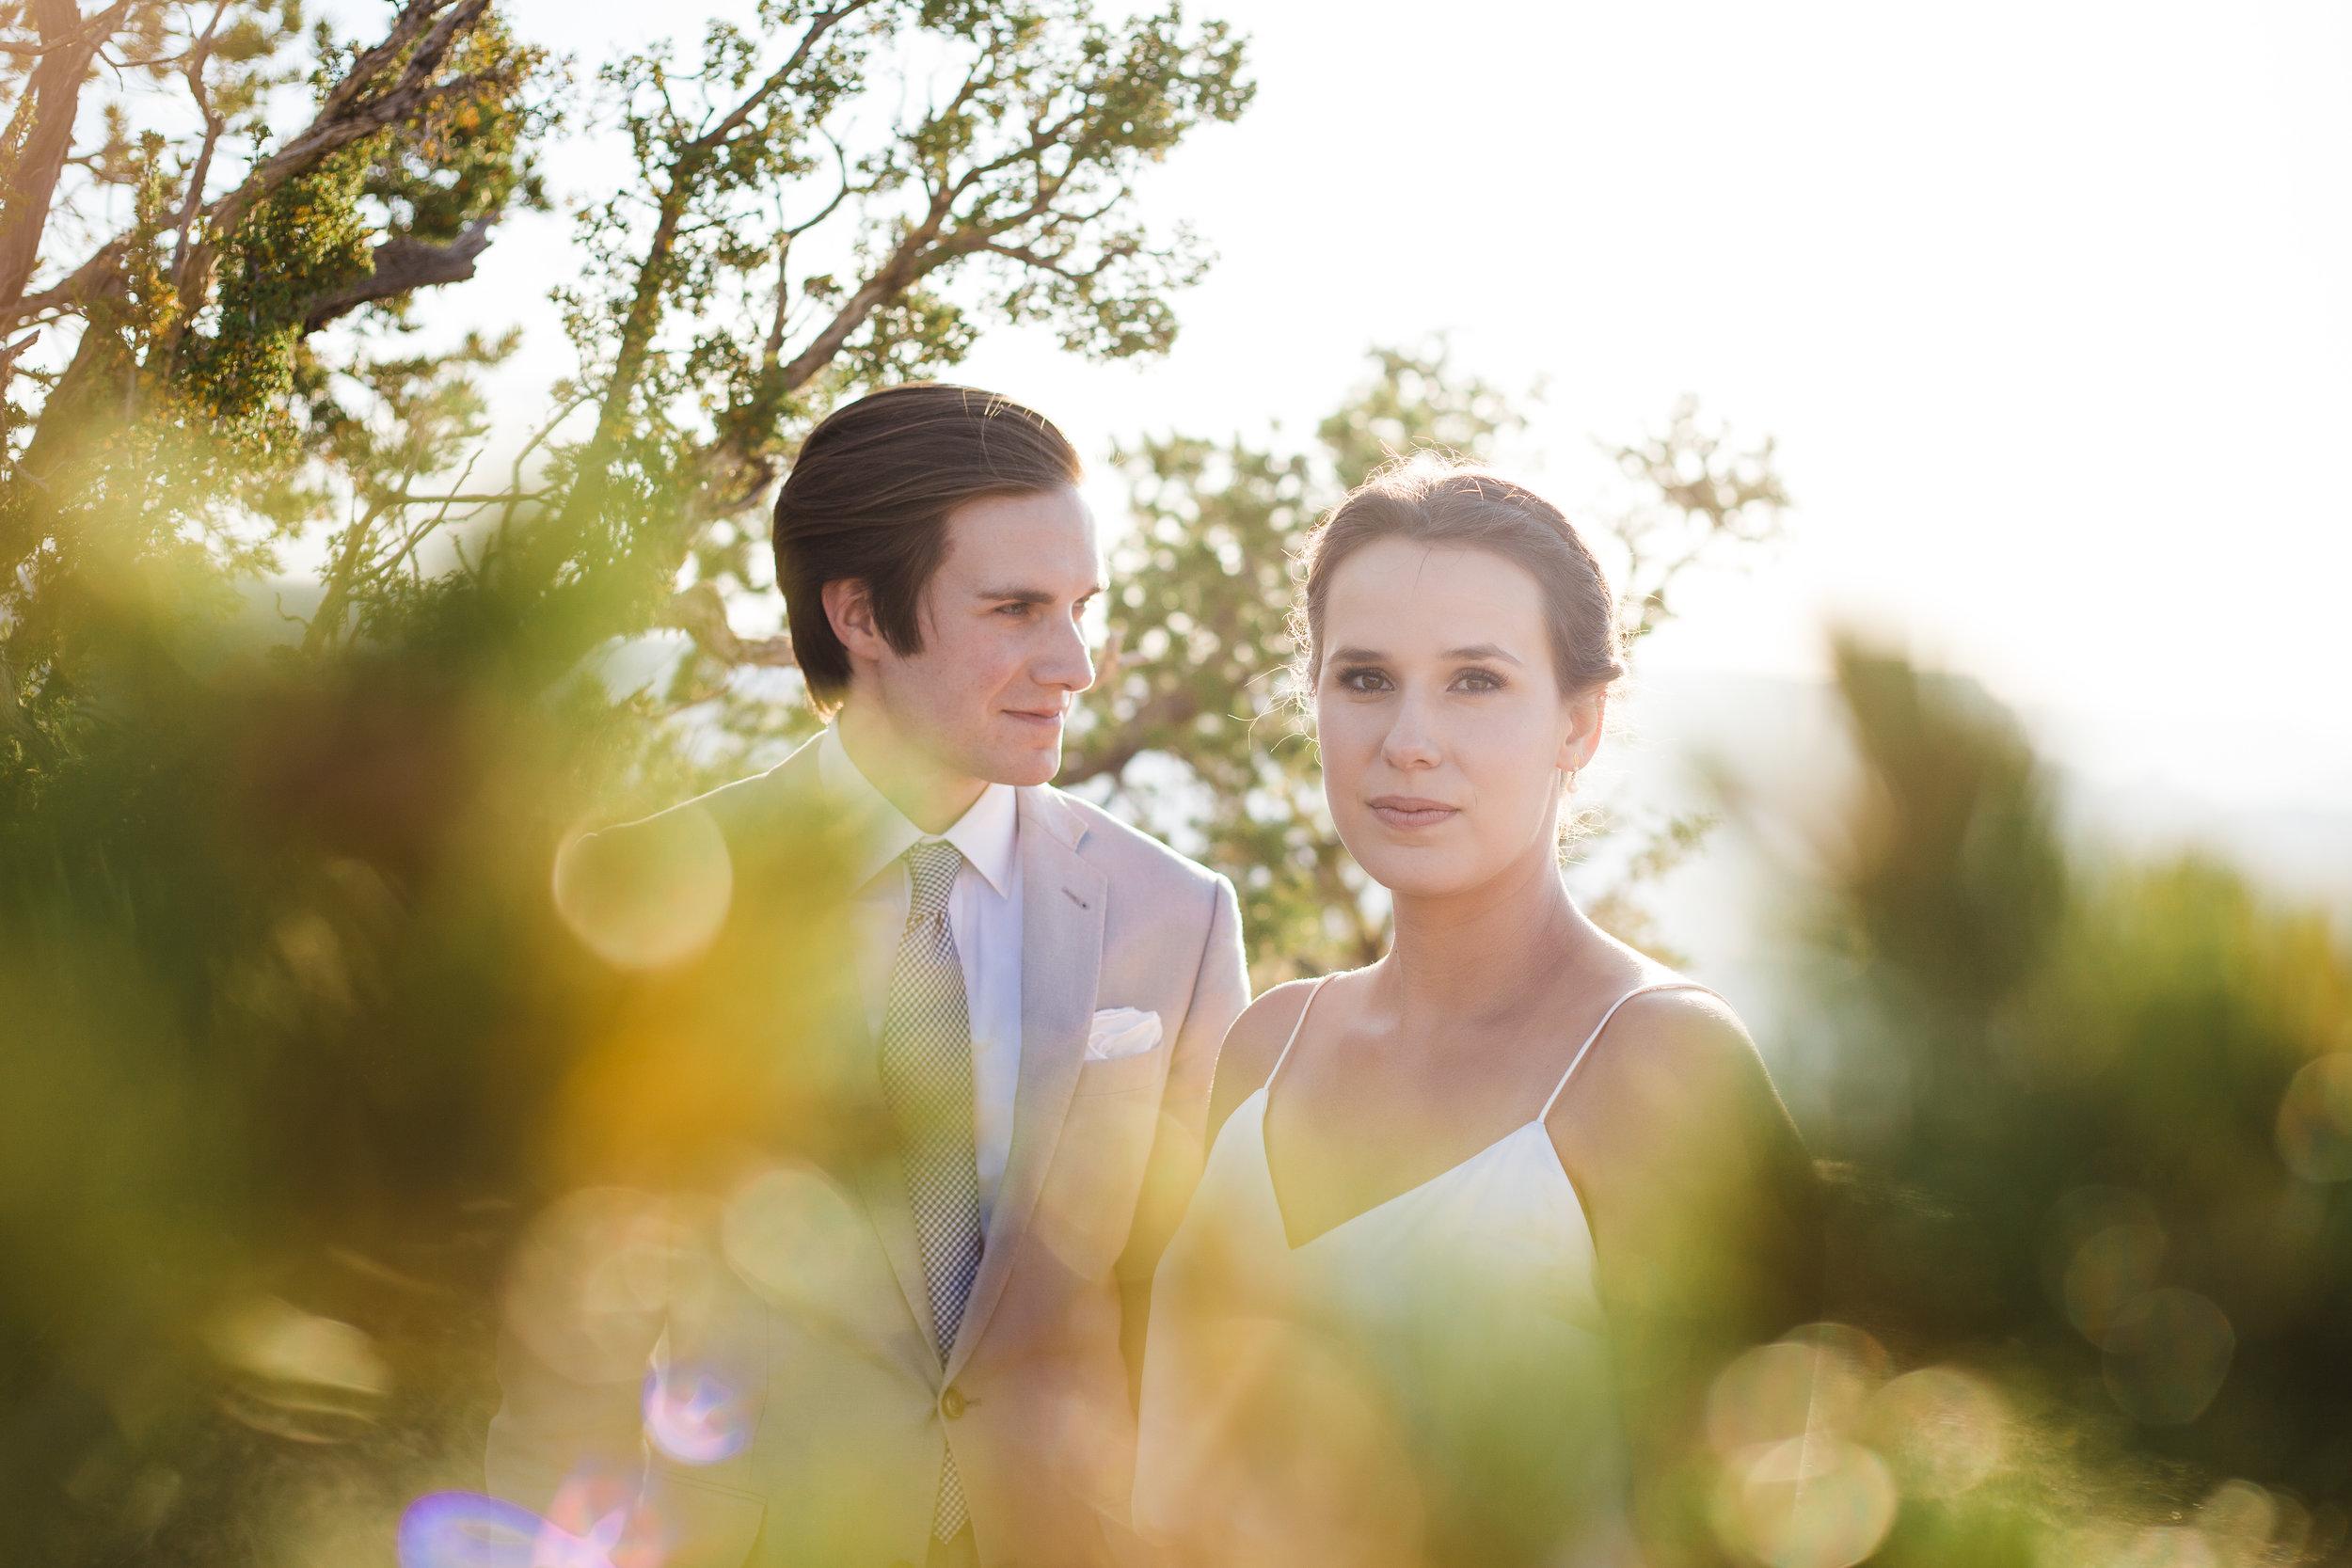 Grand Canyon wedding portrait